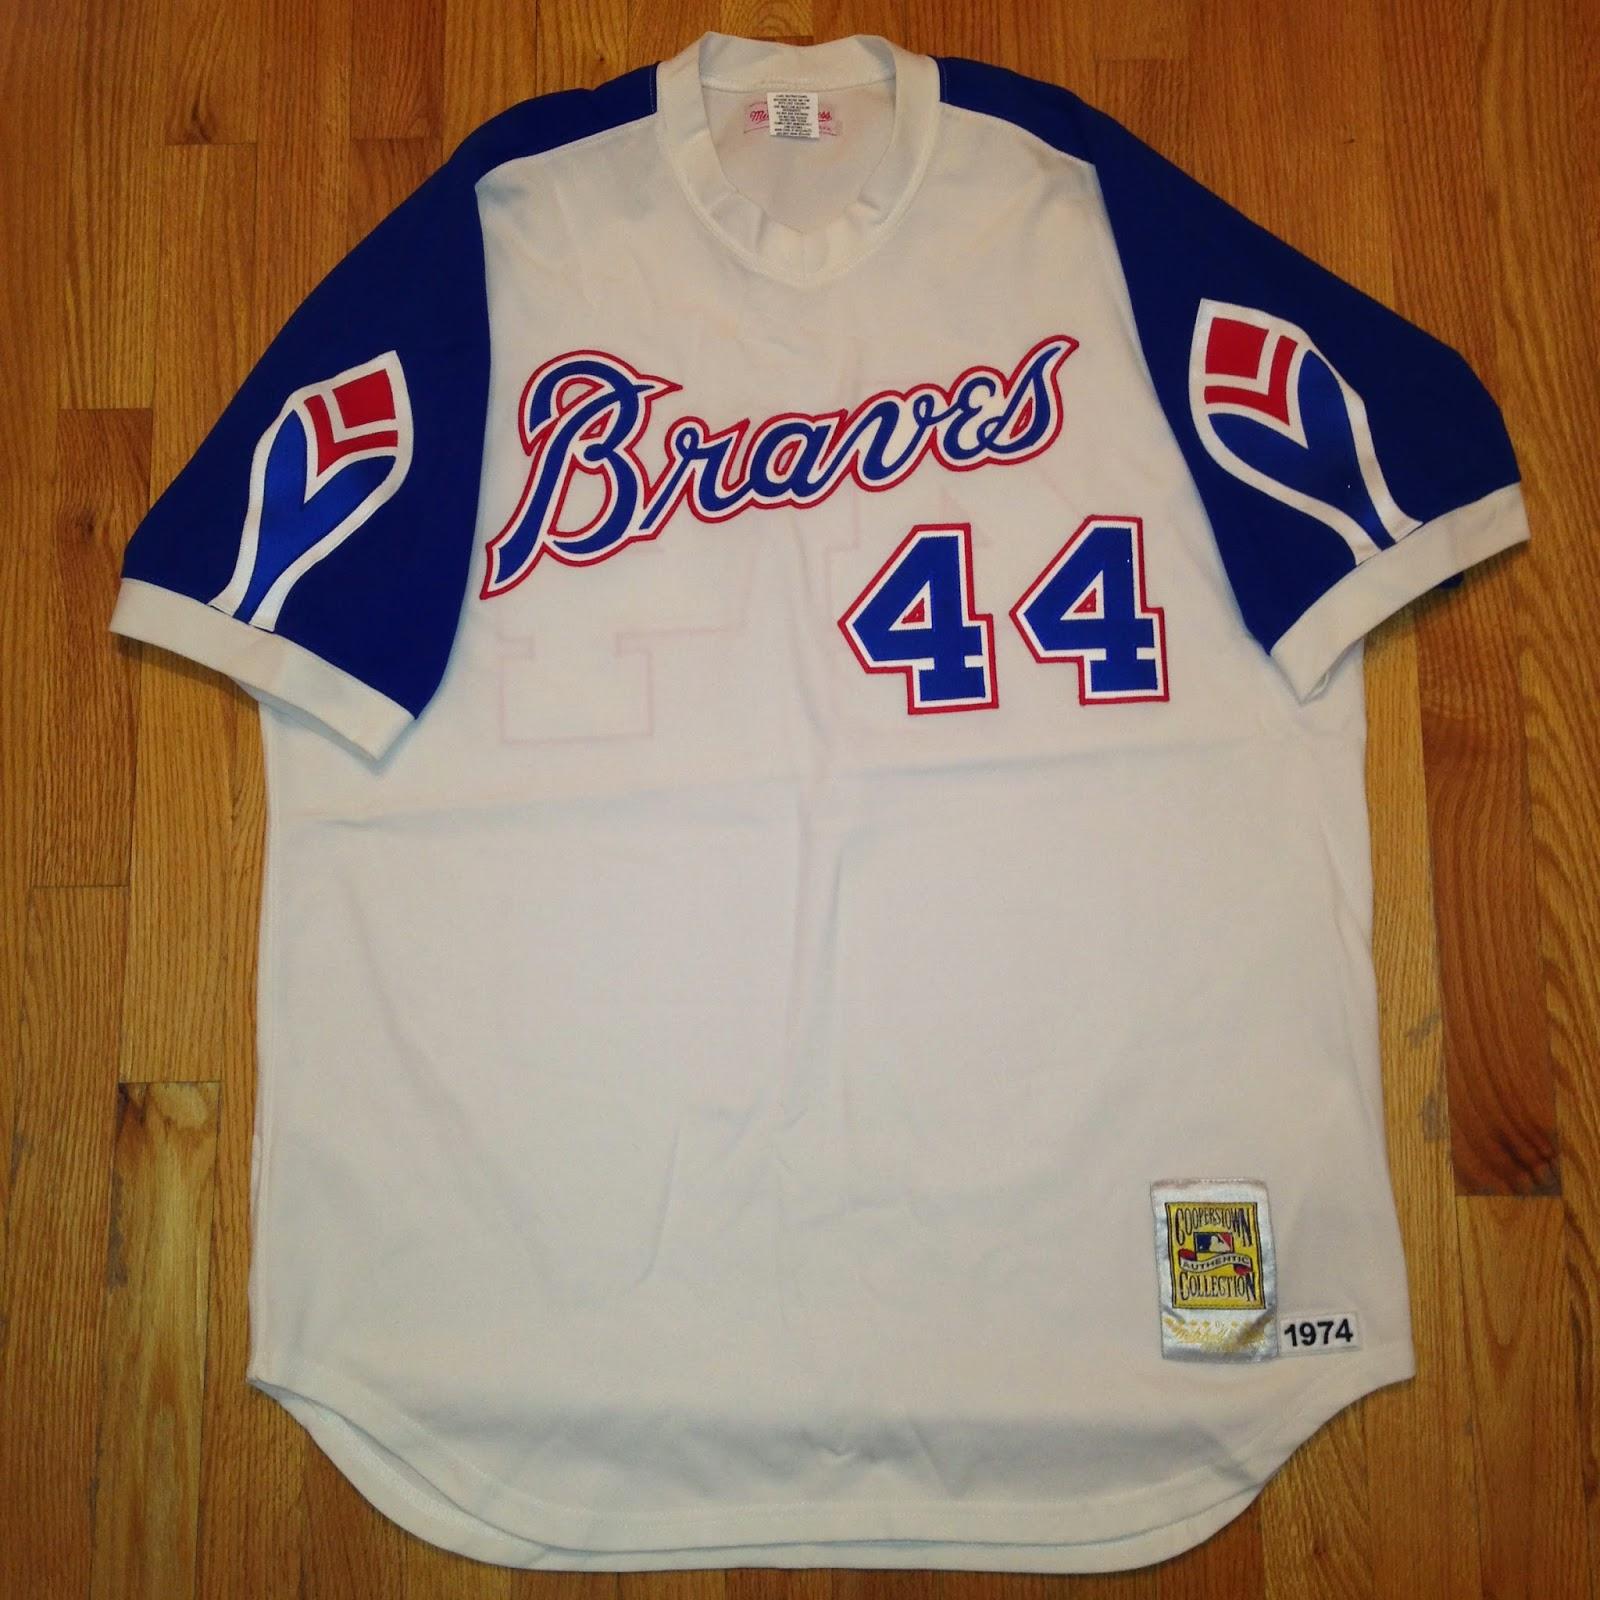 newest a6489 f8a89 Virgil's Blog: Atlanta Braves x Hank Aaron [1974]